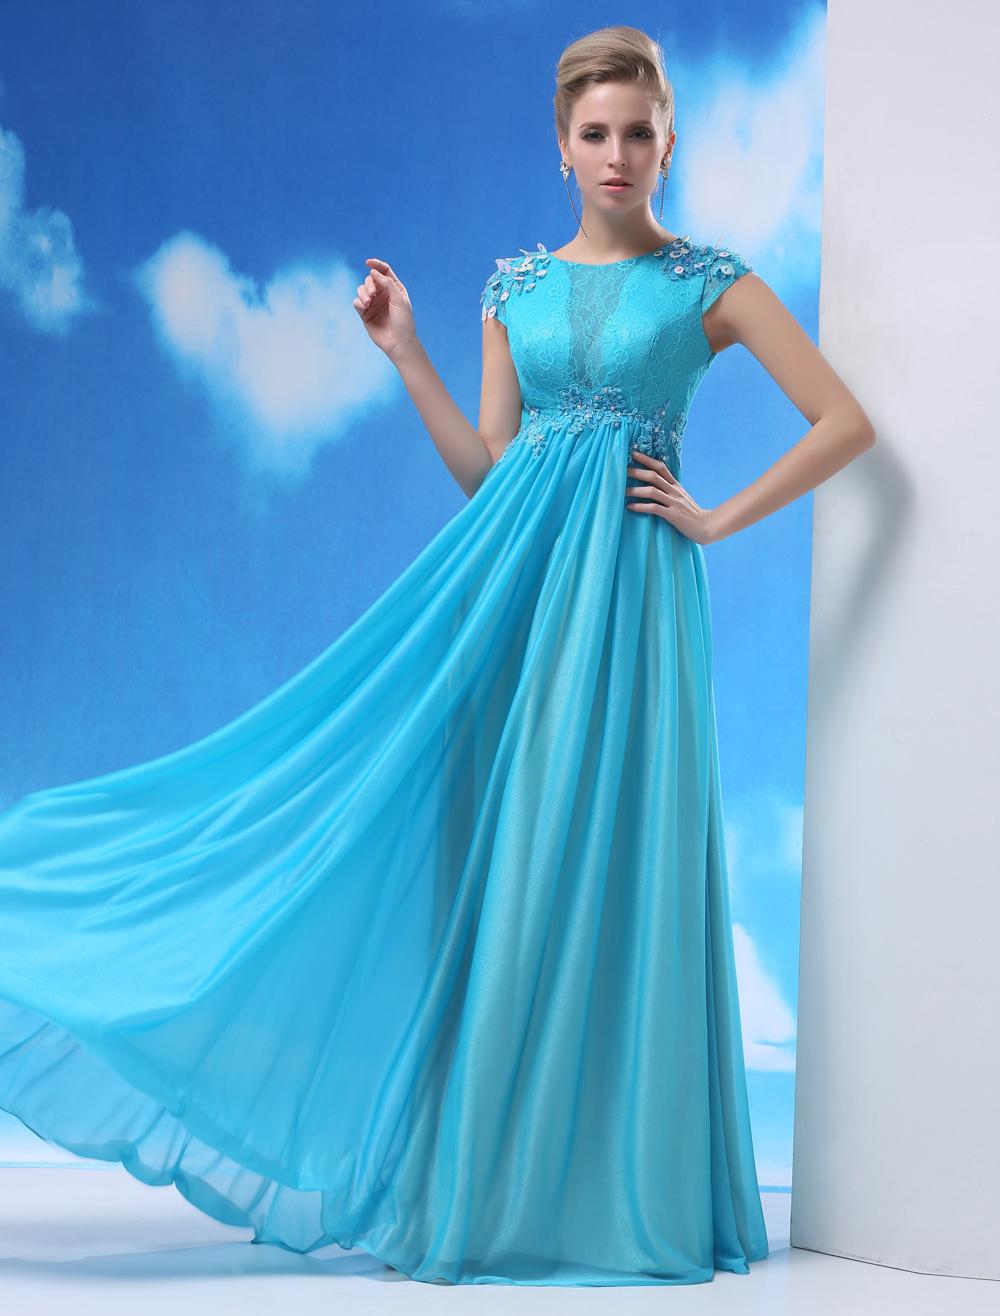 Aqua Evening Dress Shot Silk Beaded Prom Dress Jewel Neck Short Sleeves A Line Pleated Floor Length Party Dress Milanoo (Wedding Prom Dresses) photo